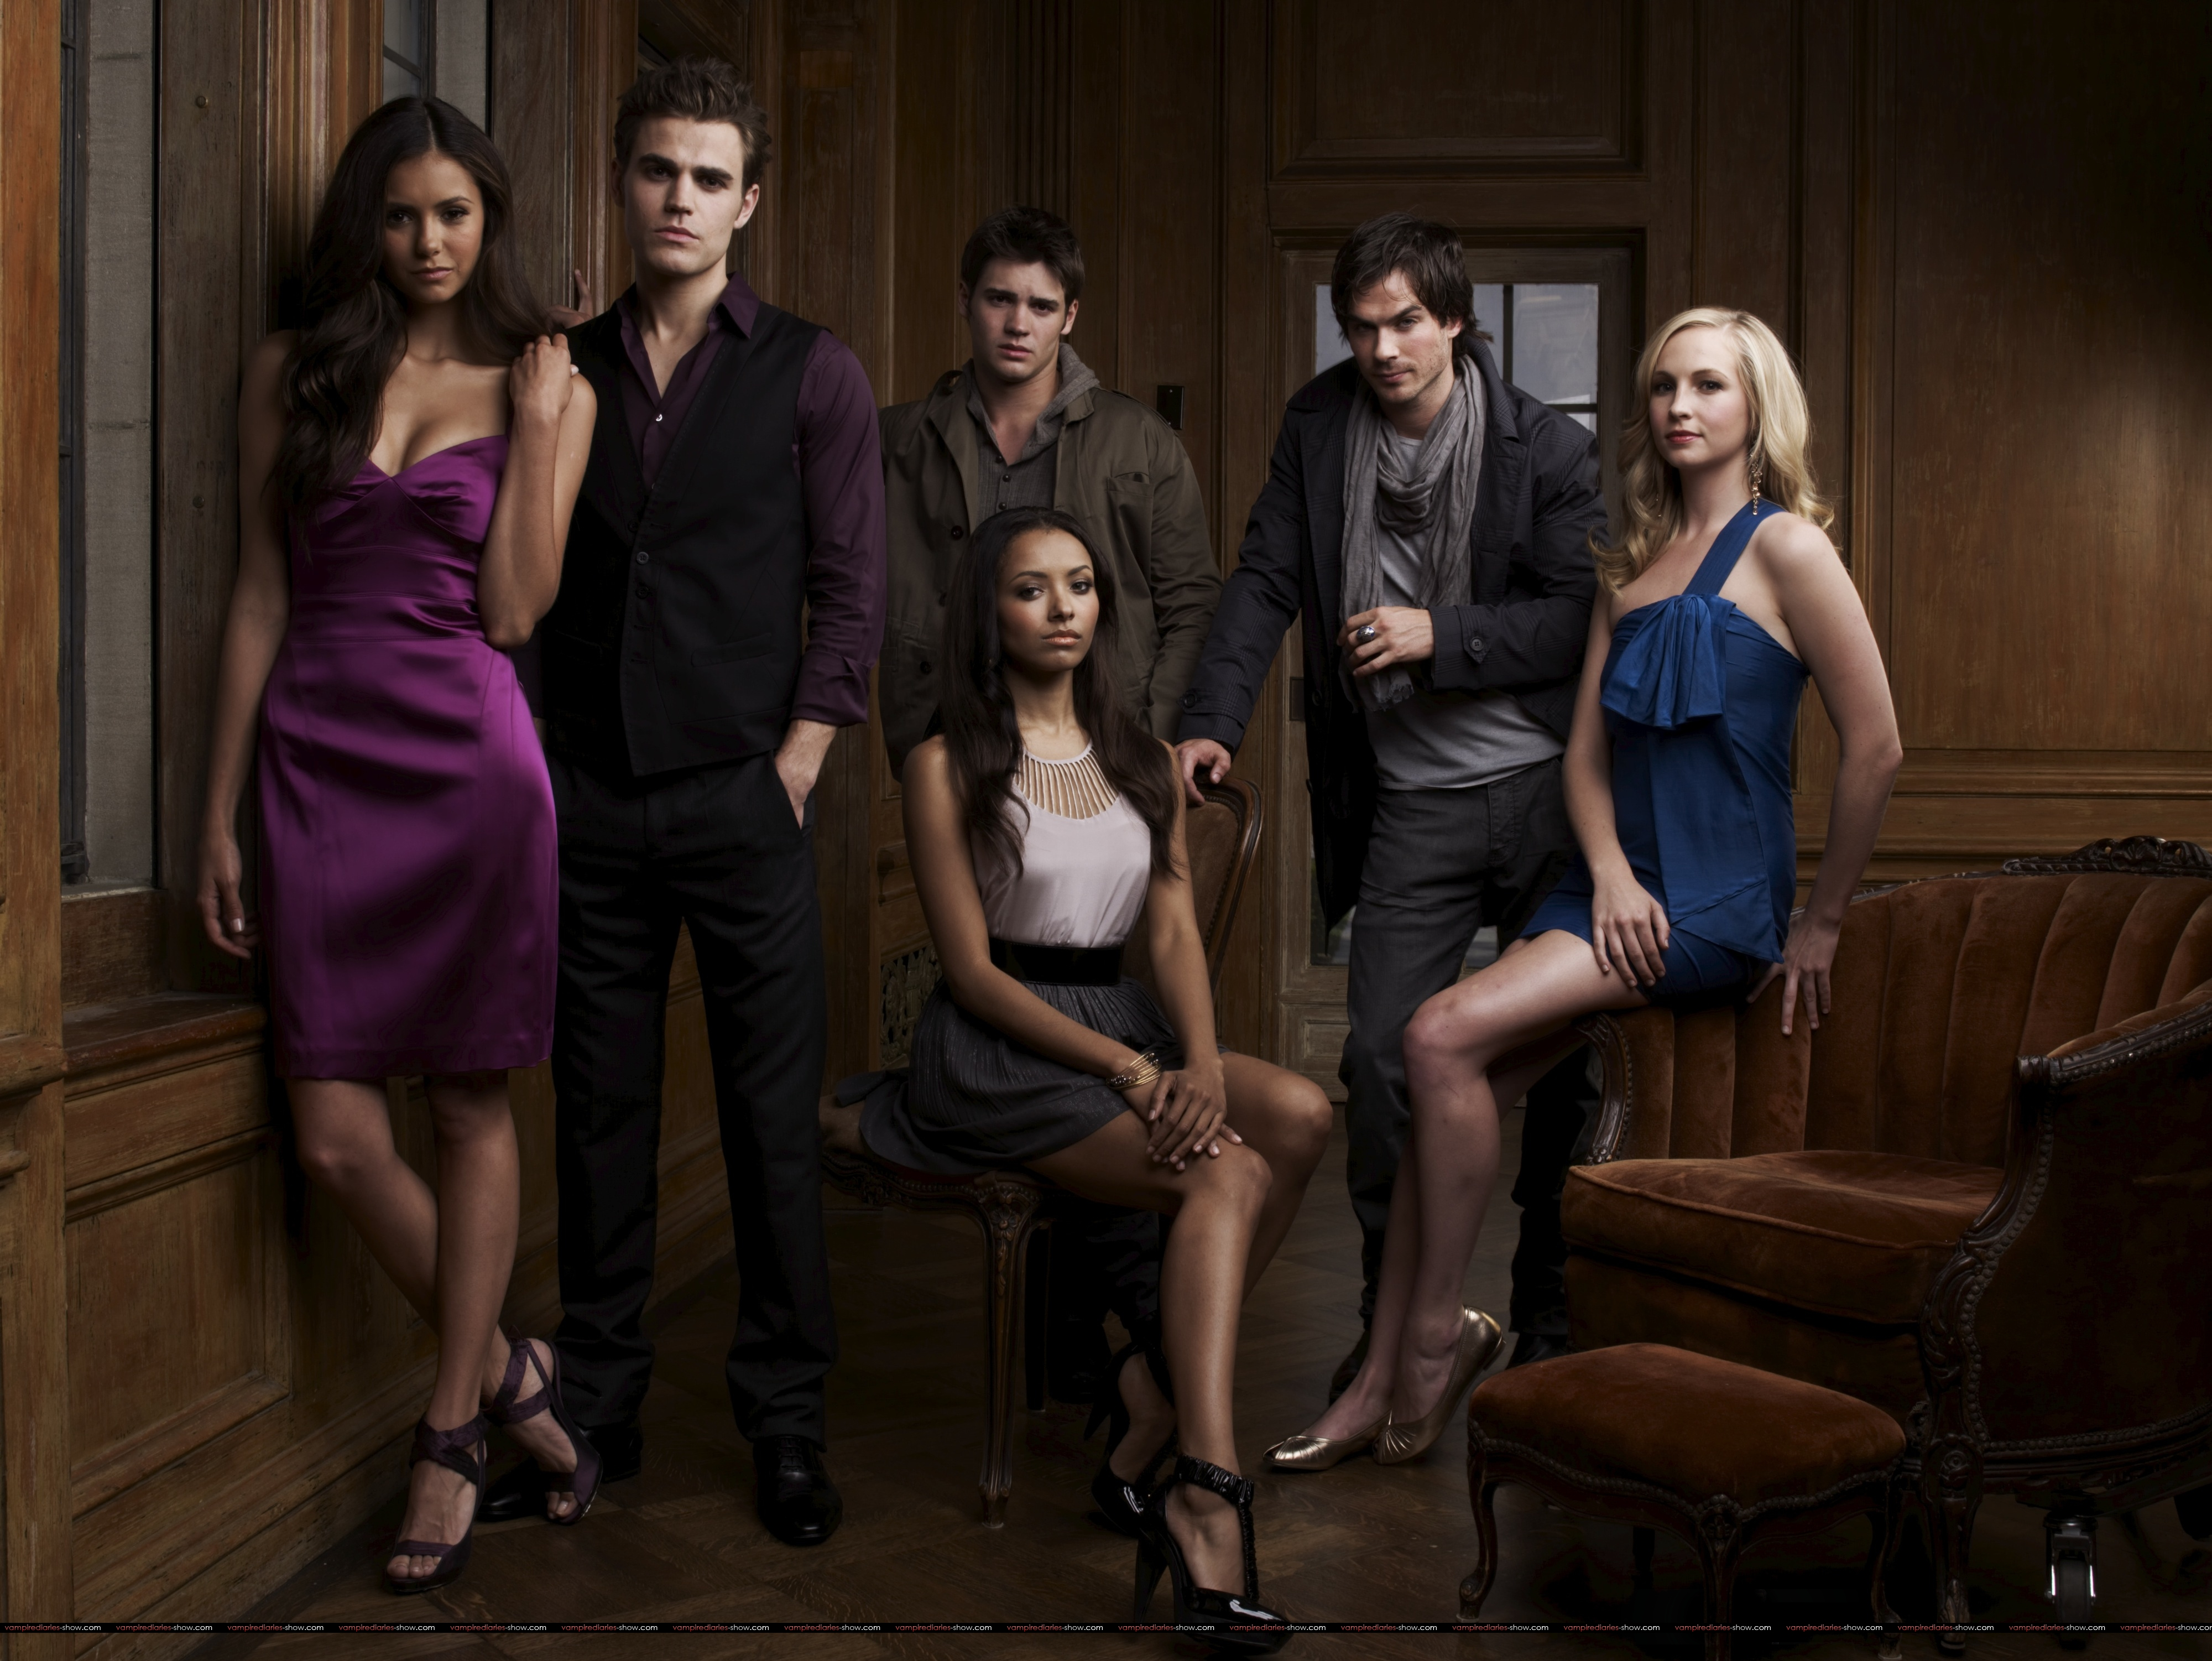 Vampire Diaries Vampire-diaries-saison-1-fond-ecran